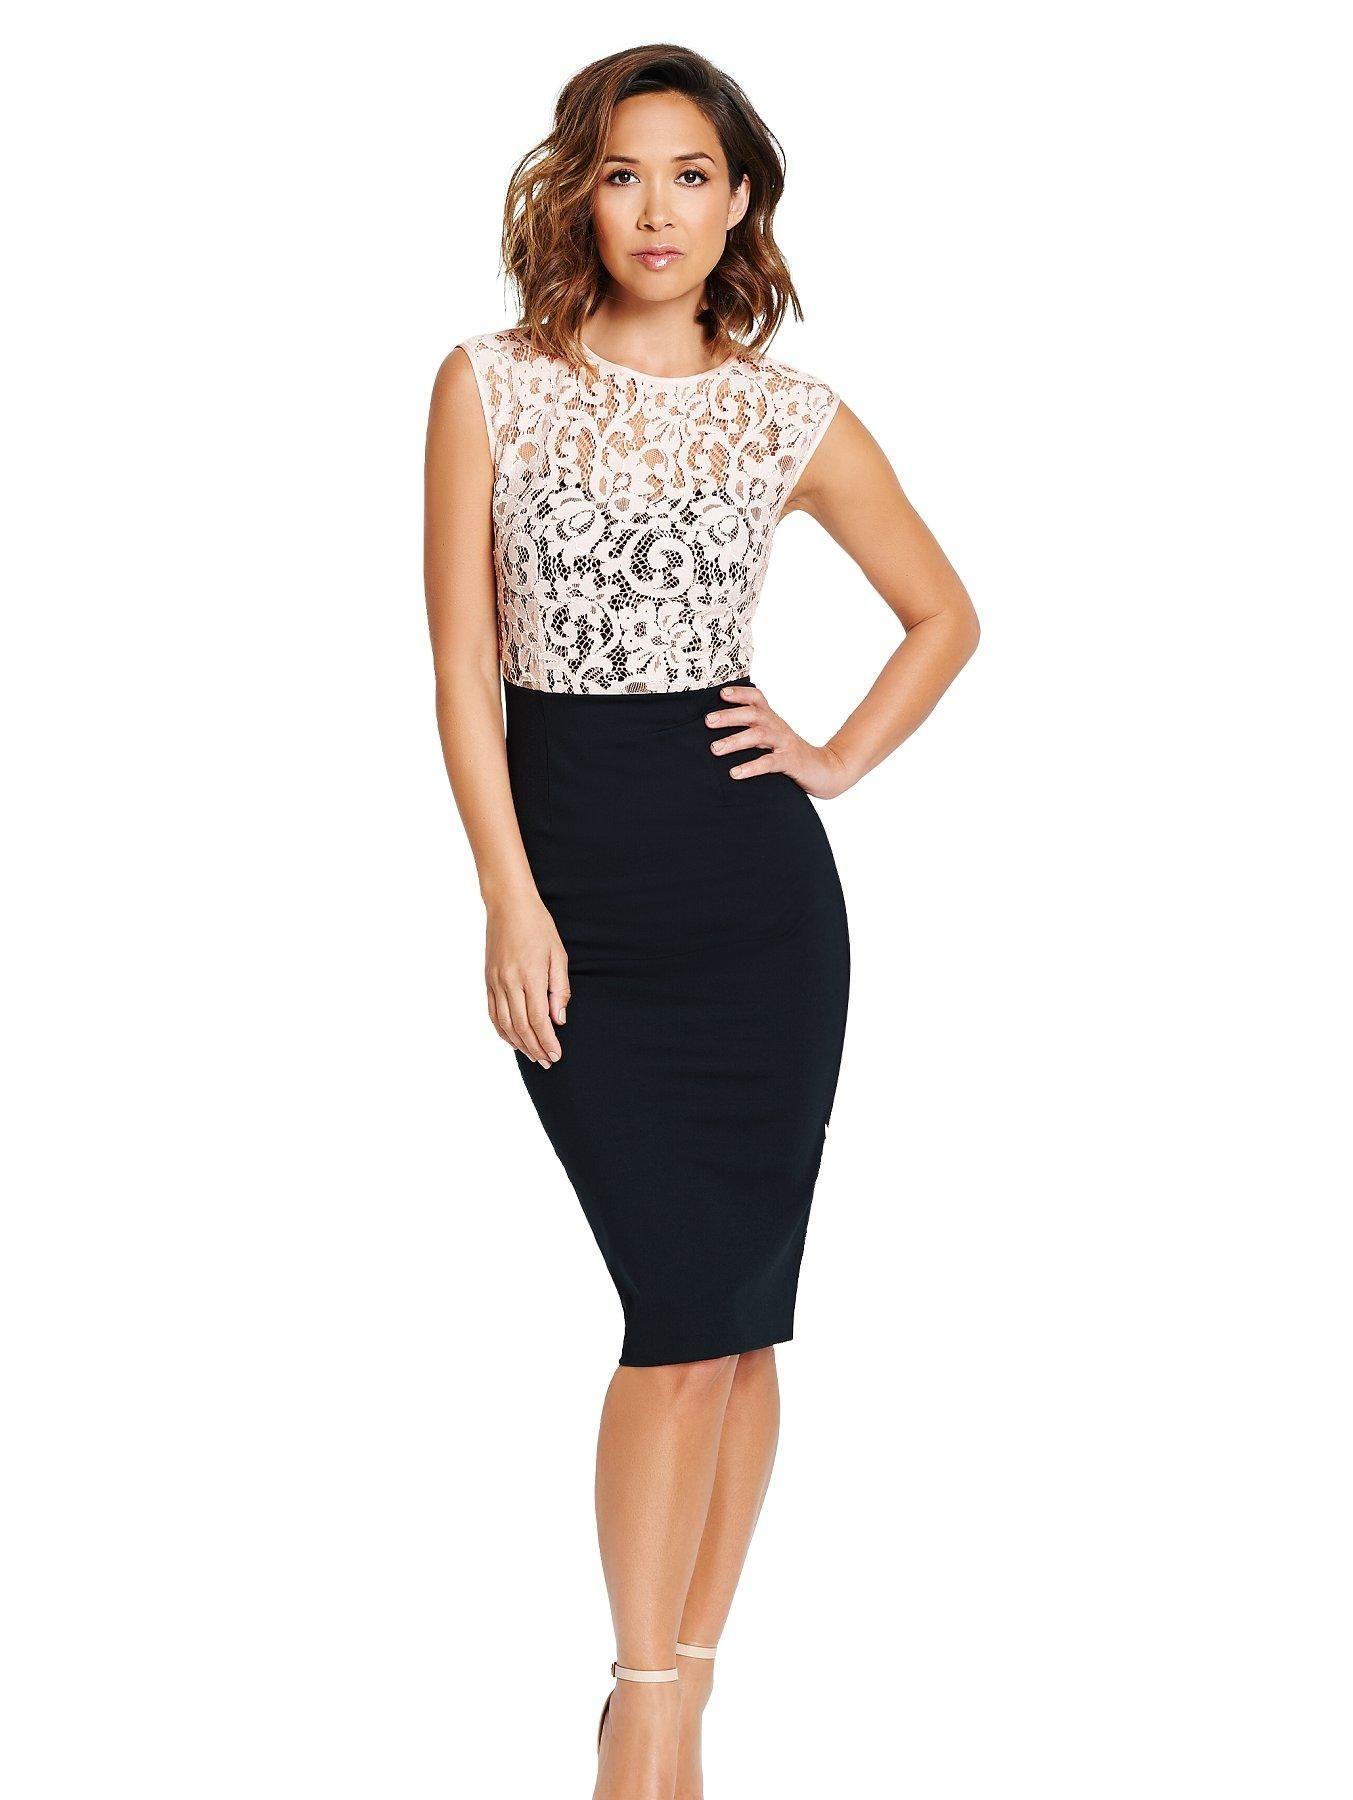 Myleene Klass Lace Top Dress | littlewoods.com | Things to Wear ...